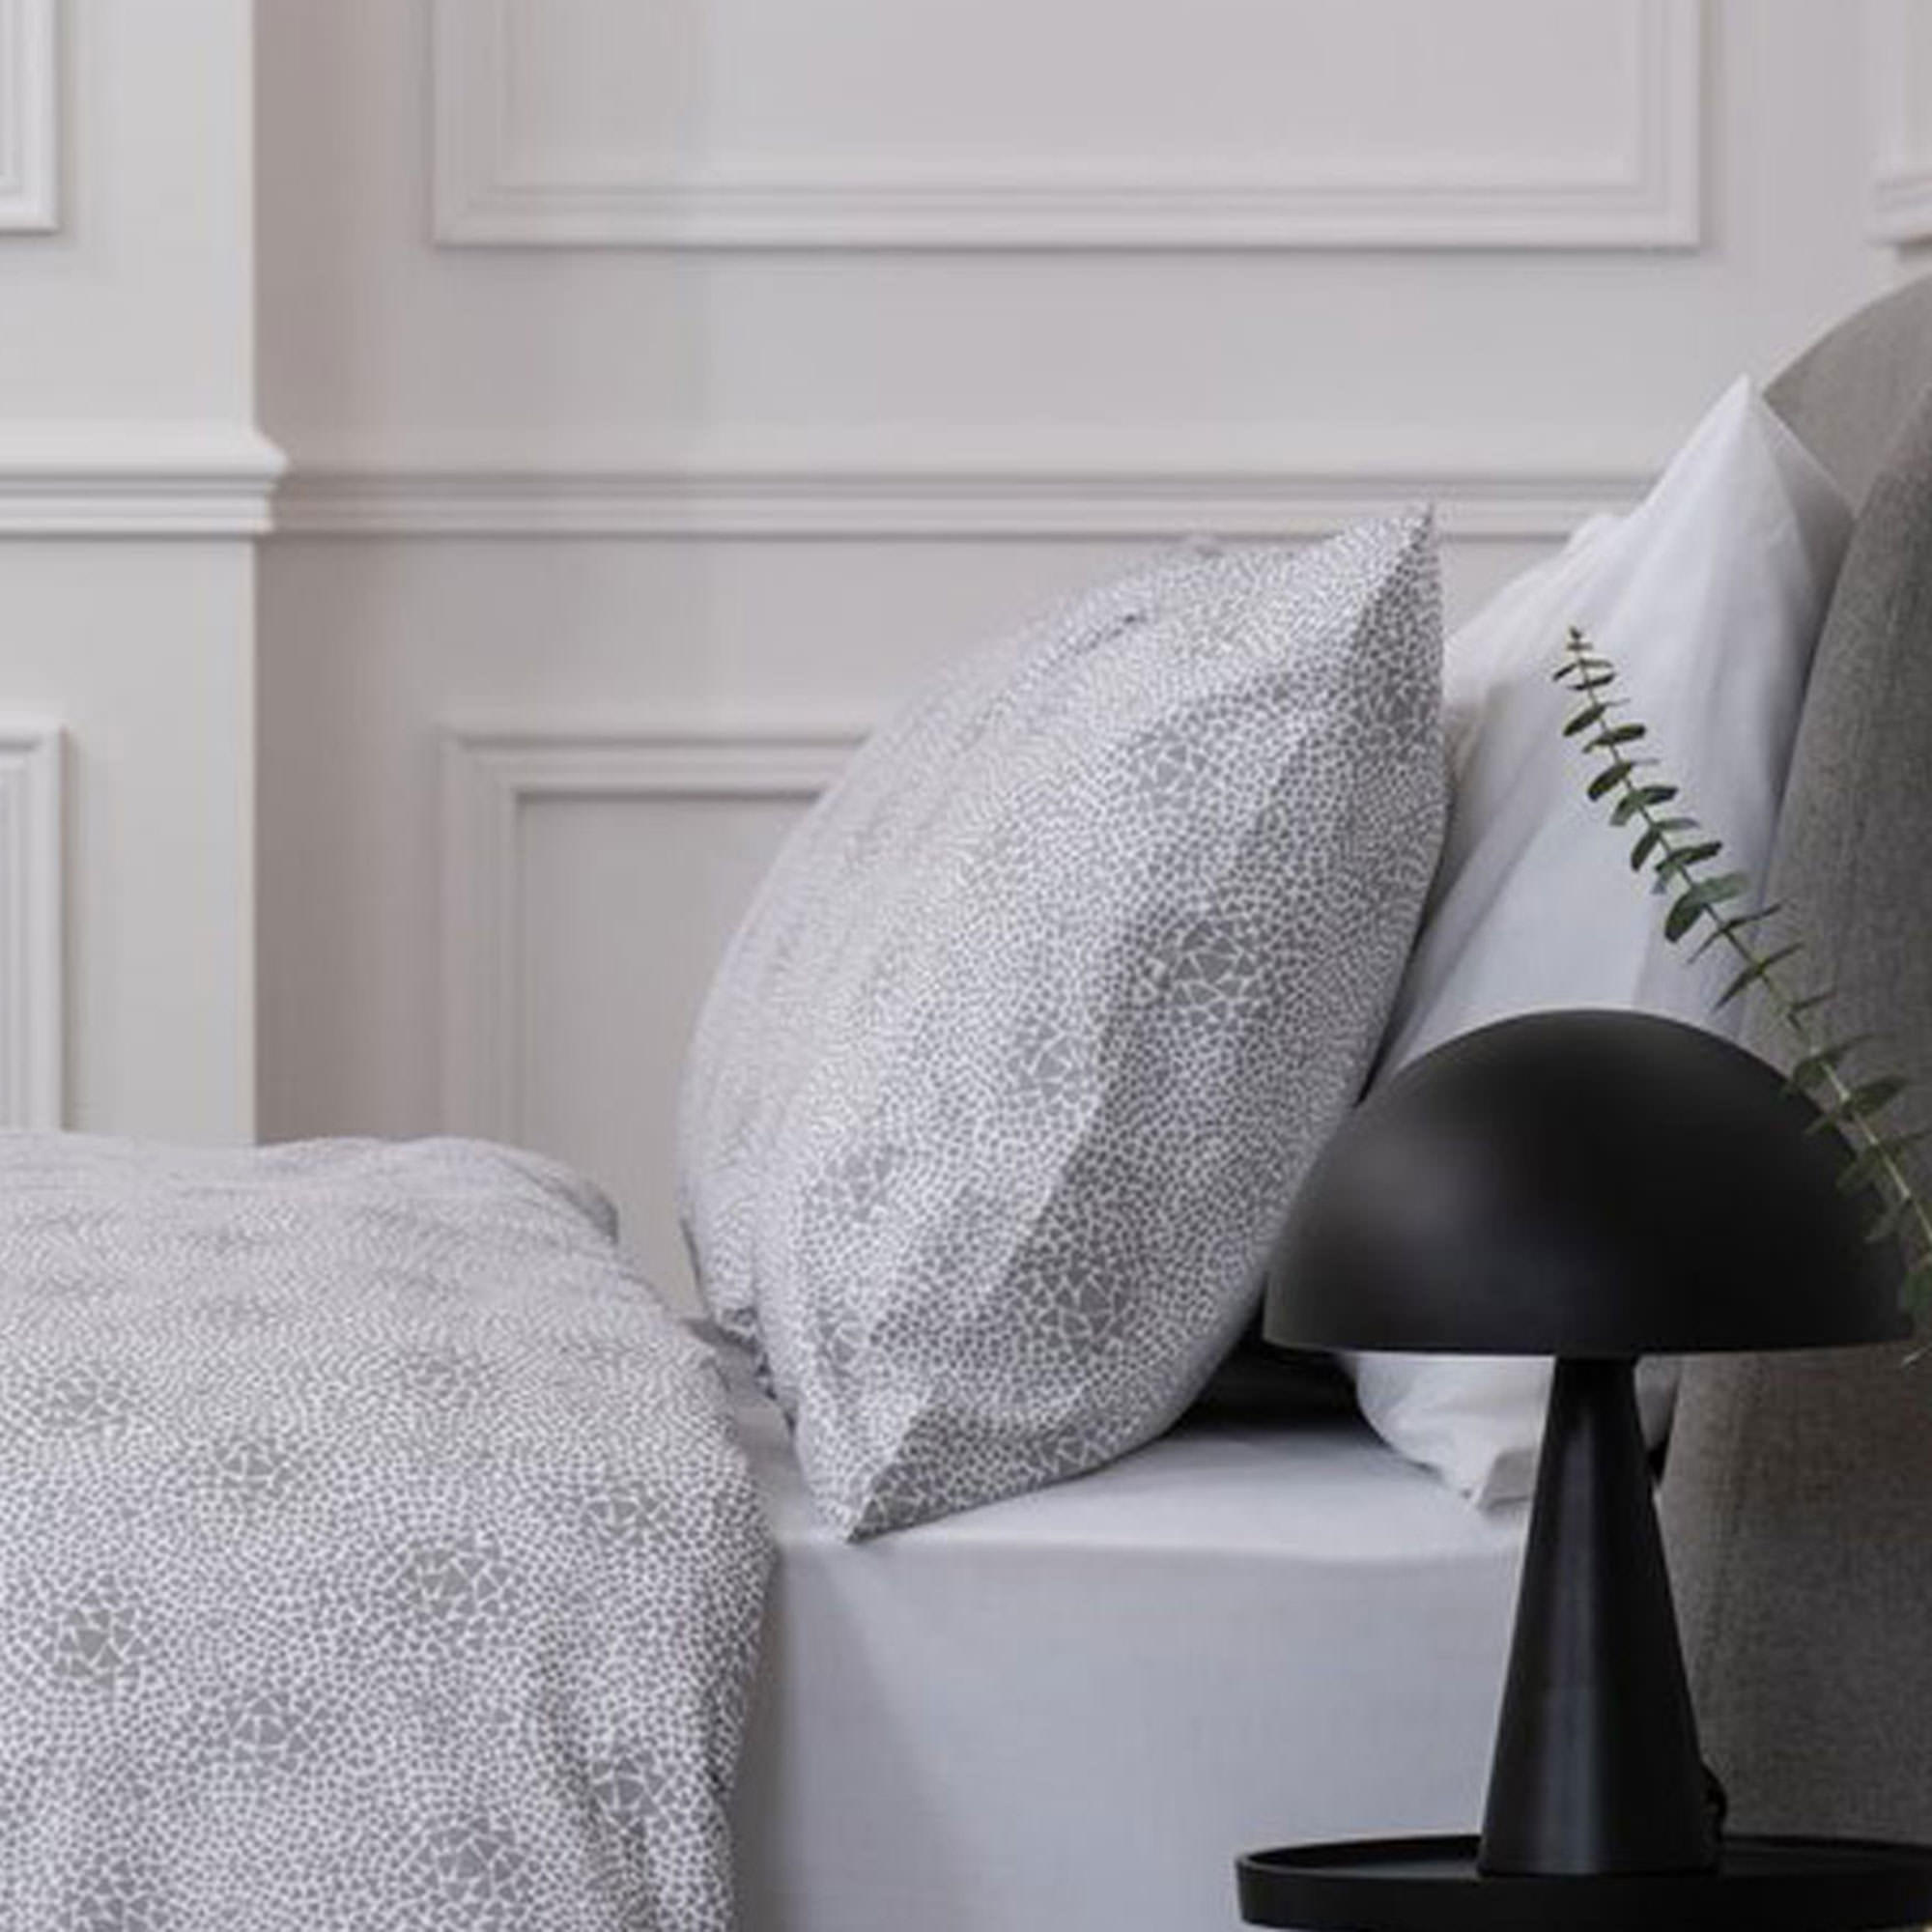 5617BROKENTRIANGLEPCMULTI: Broken Triangle Pillowcase